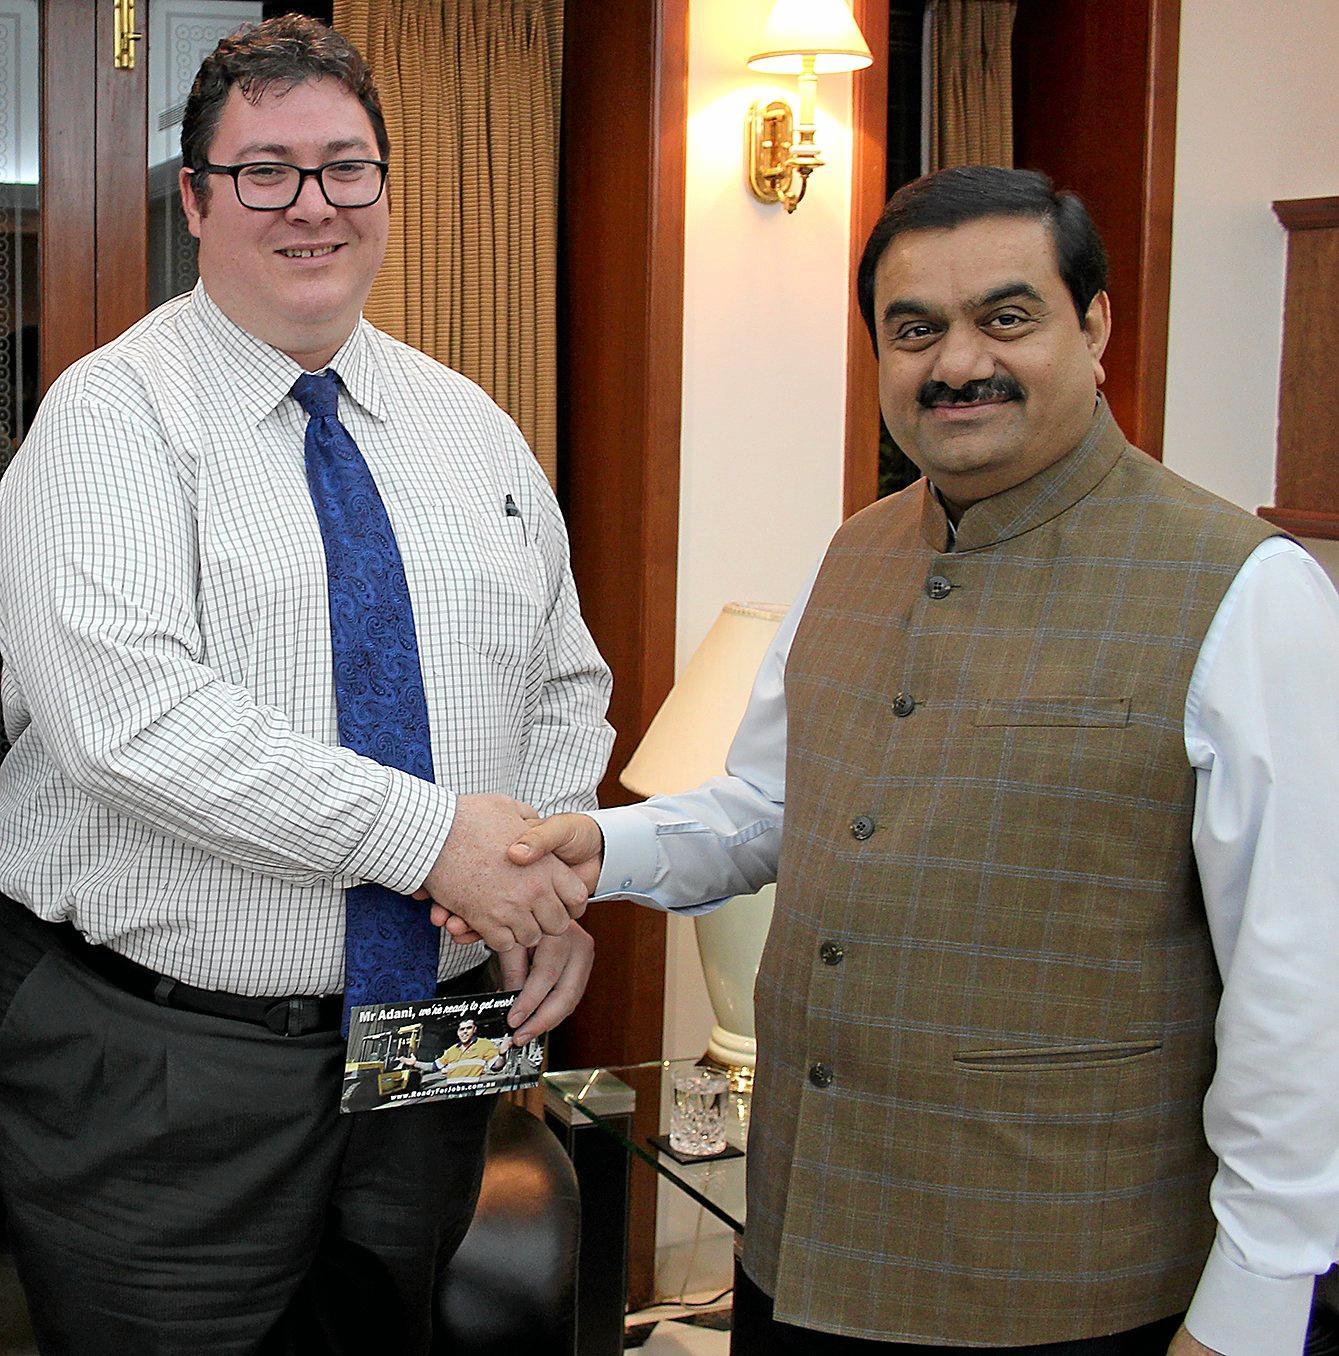 Dawson MP George Christensen with Adani Group chairman Gautam Adani. Photo Contributed